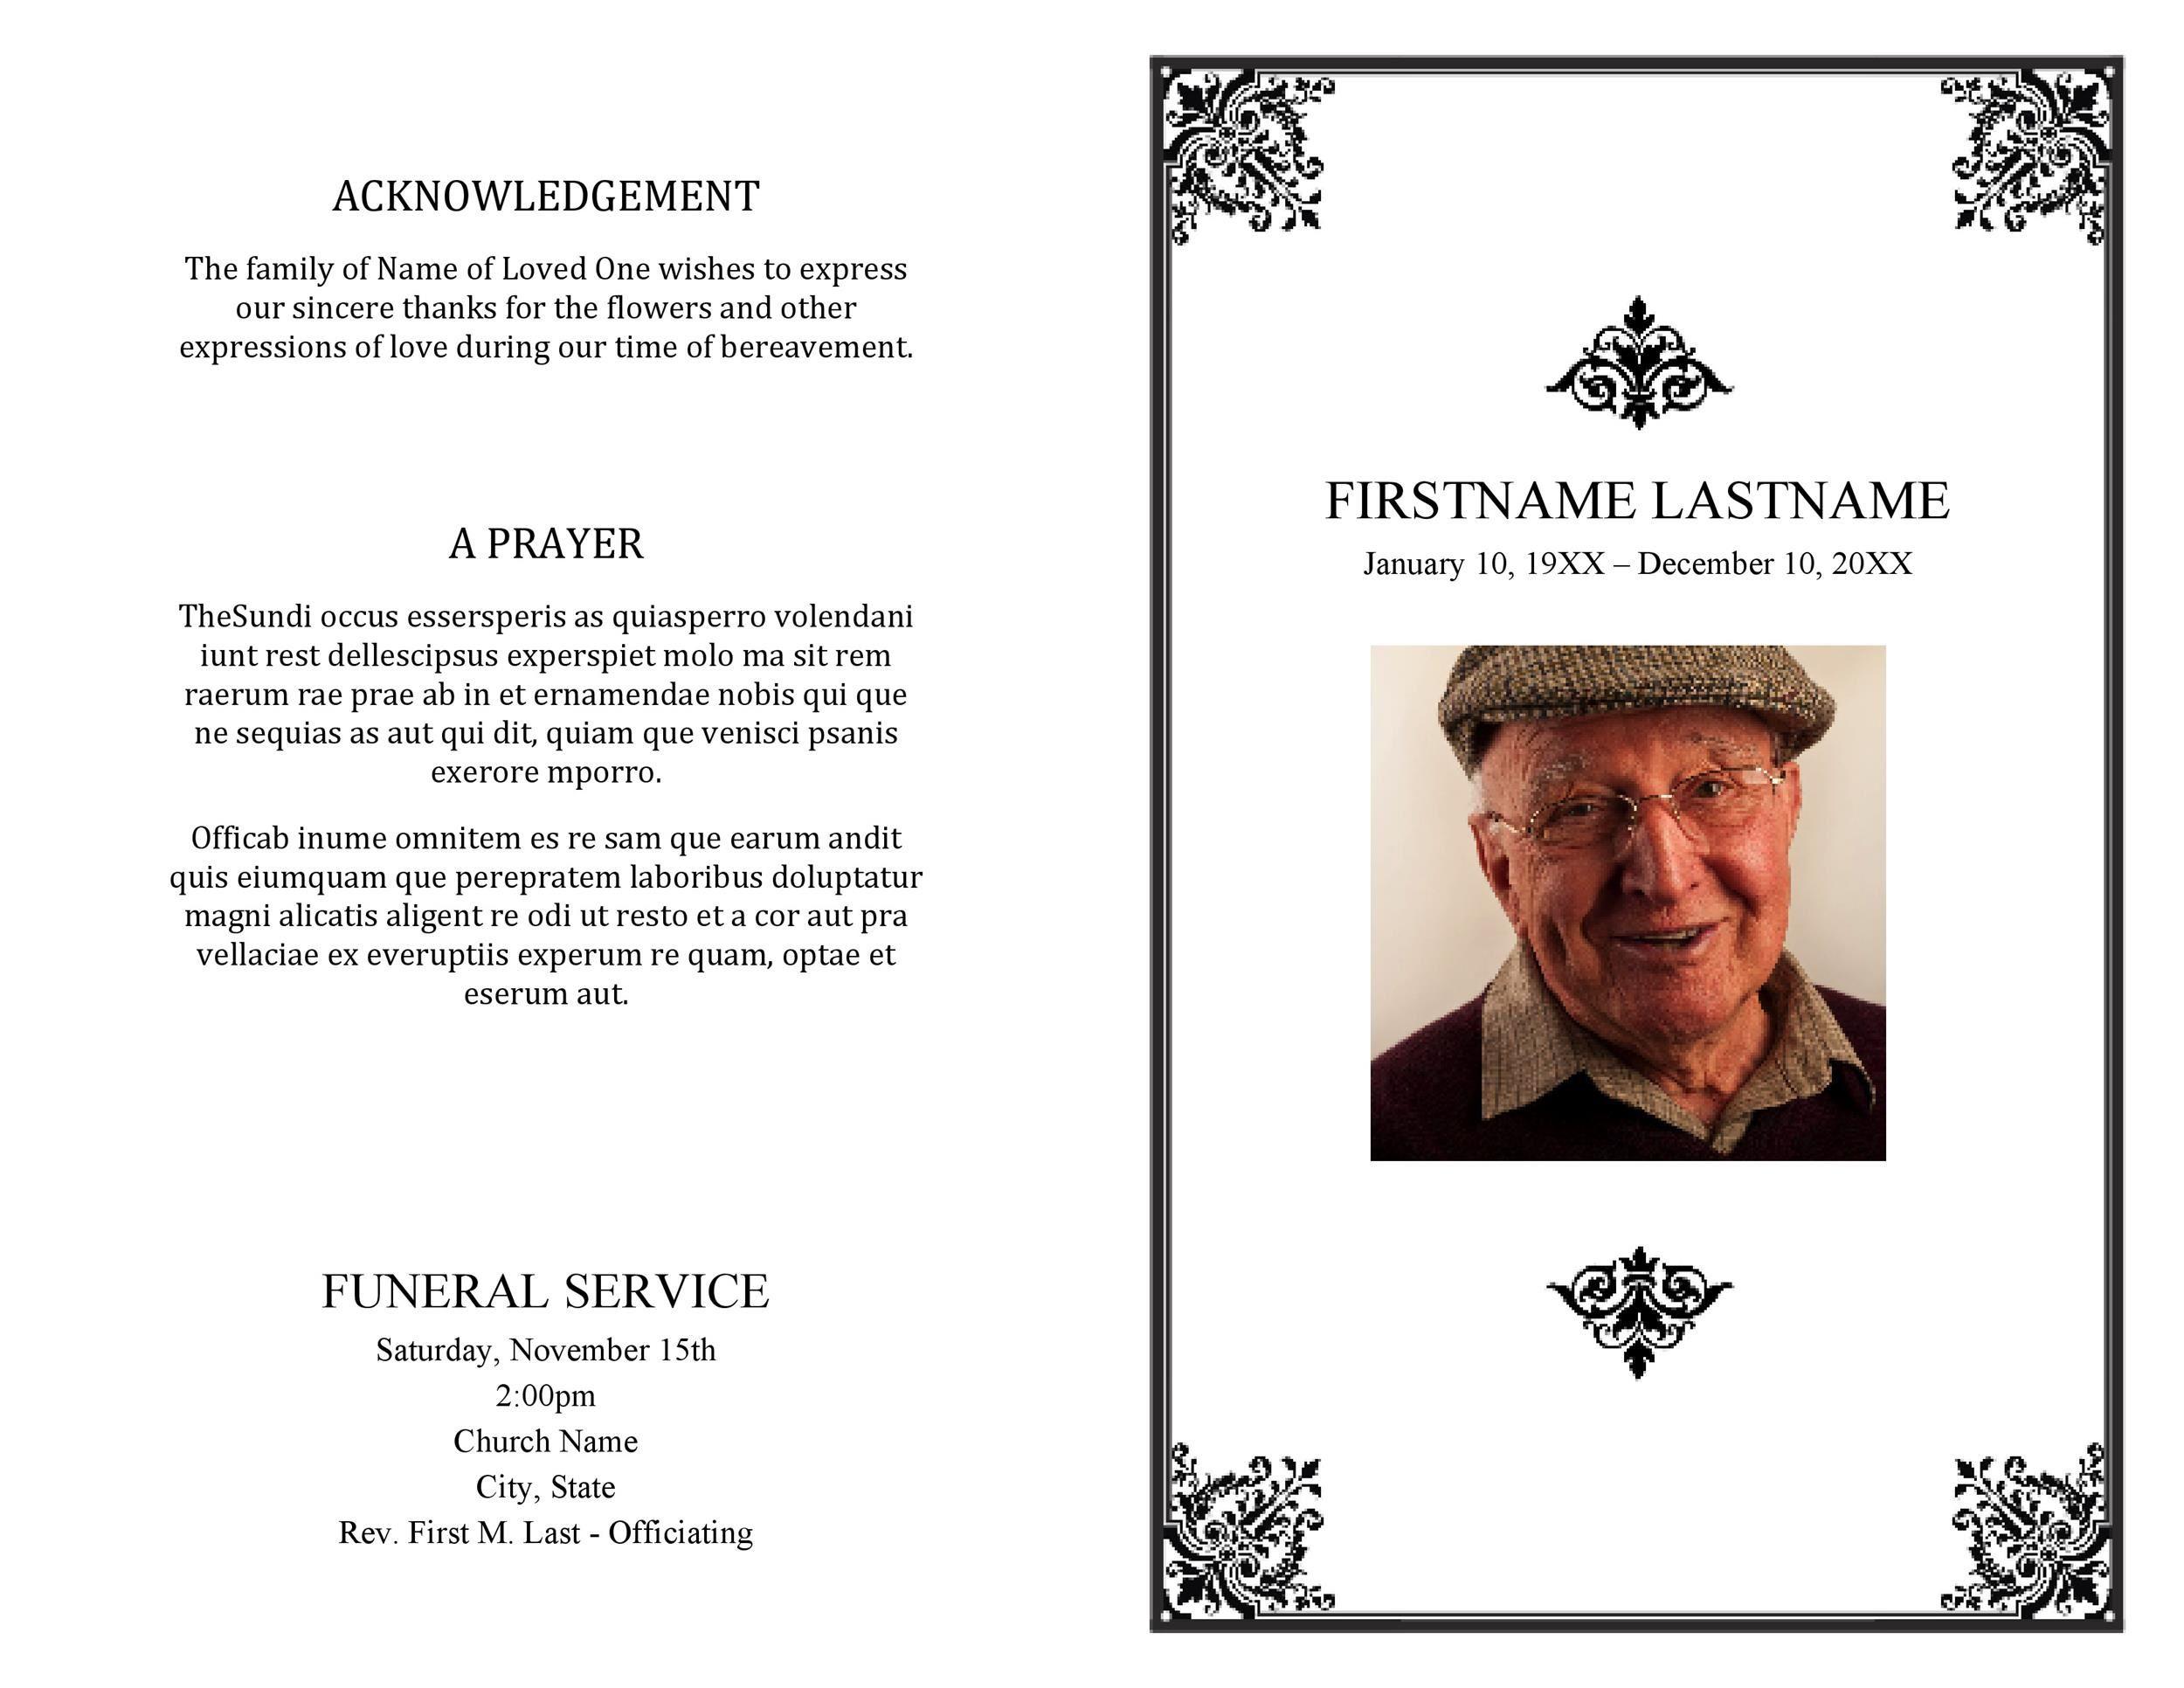 005 Incredible Free Funeral Program Template Word Concept  Microsoft 2010 Tri FoldFull